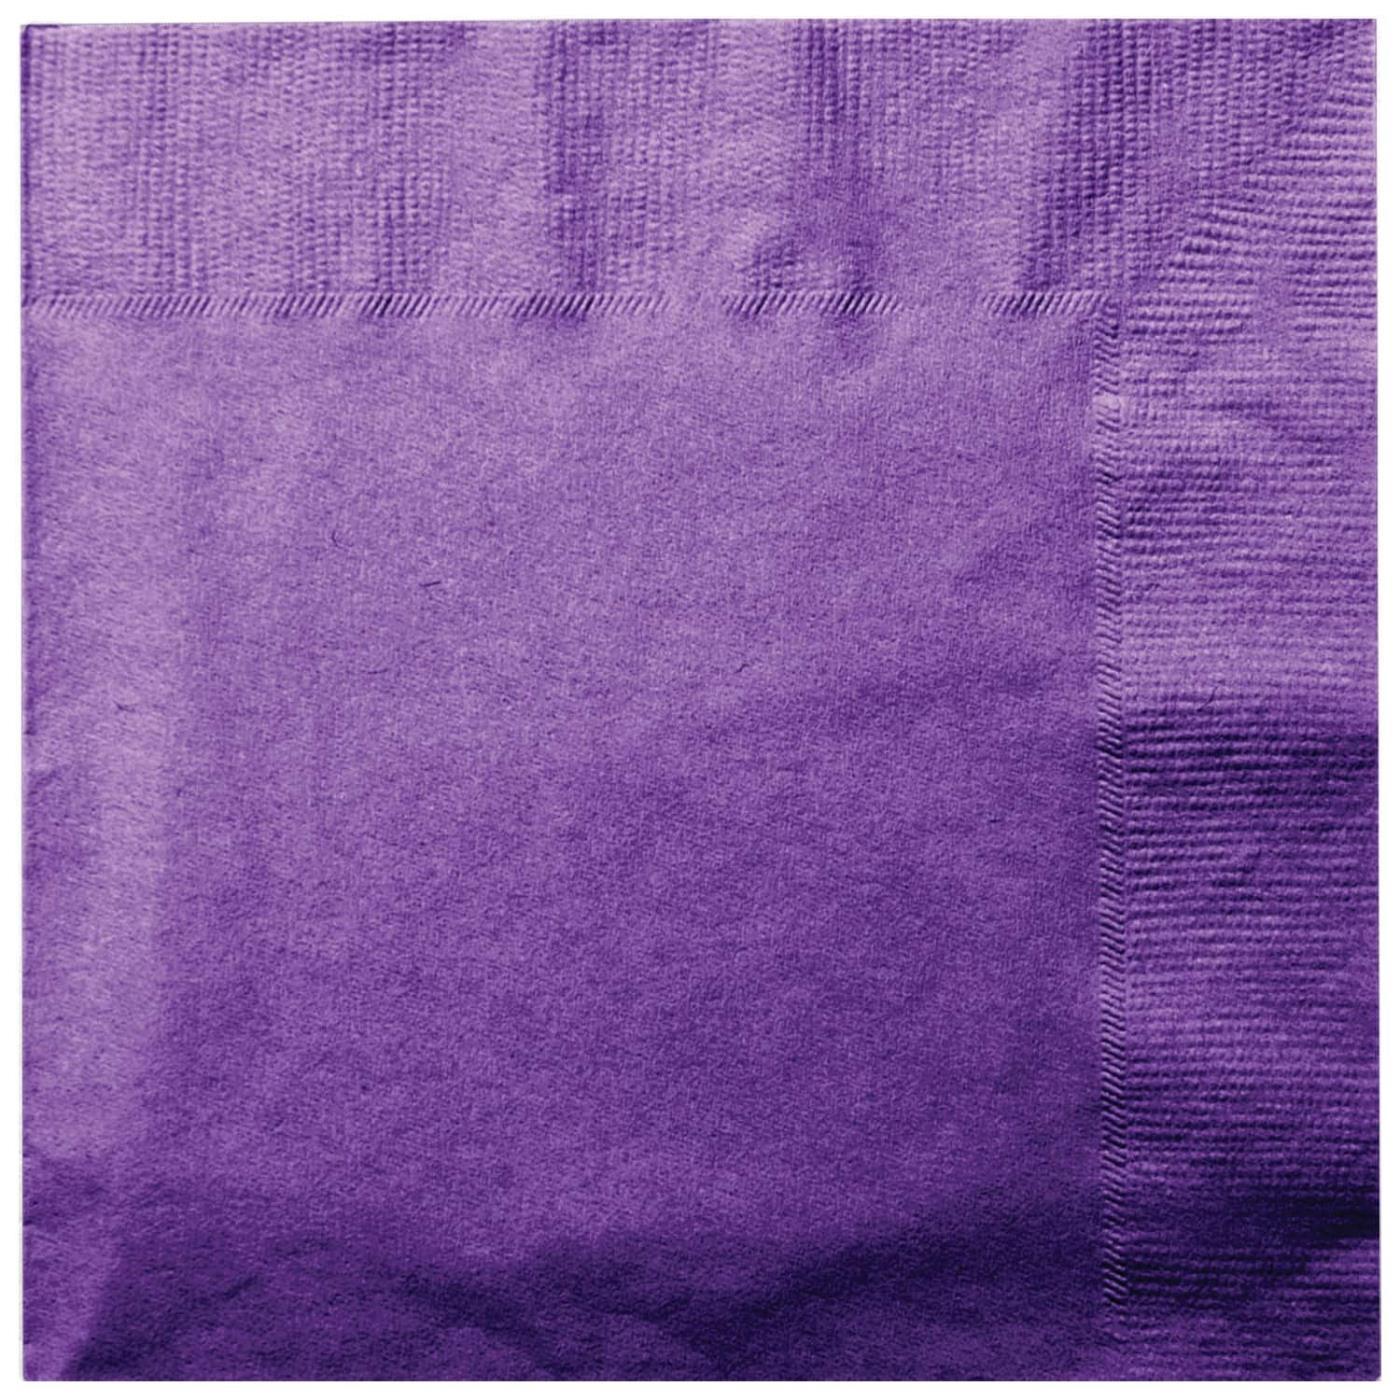 Paper Cocktail Napkins-Box of 100 - Purple